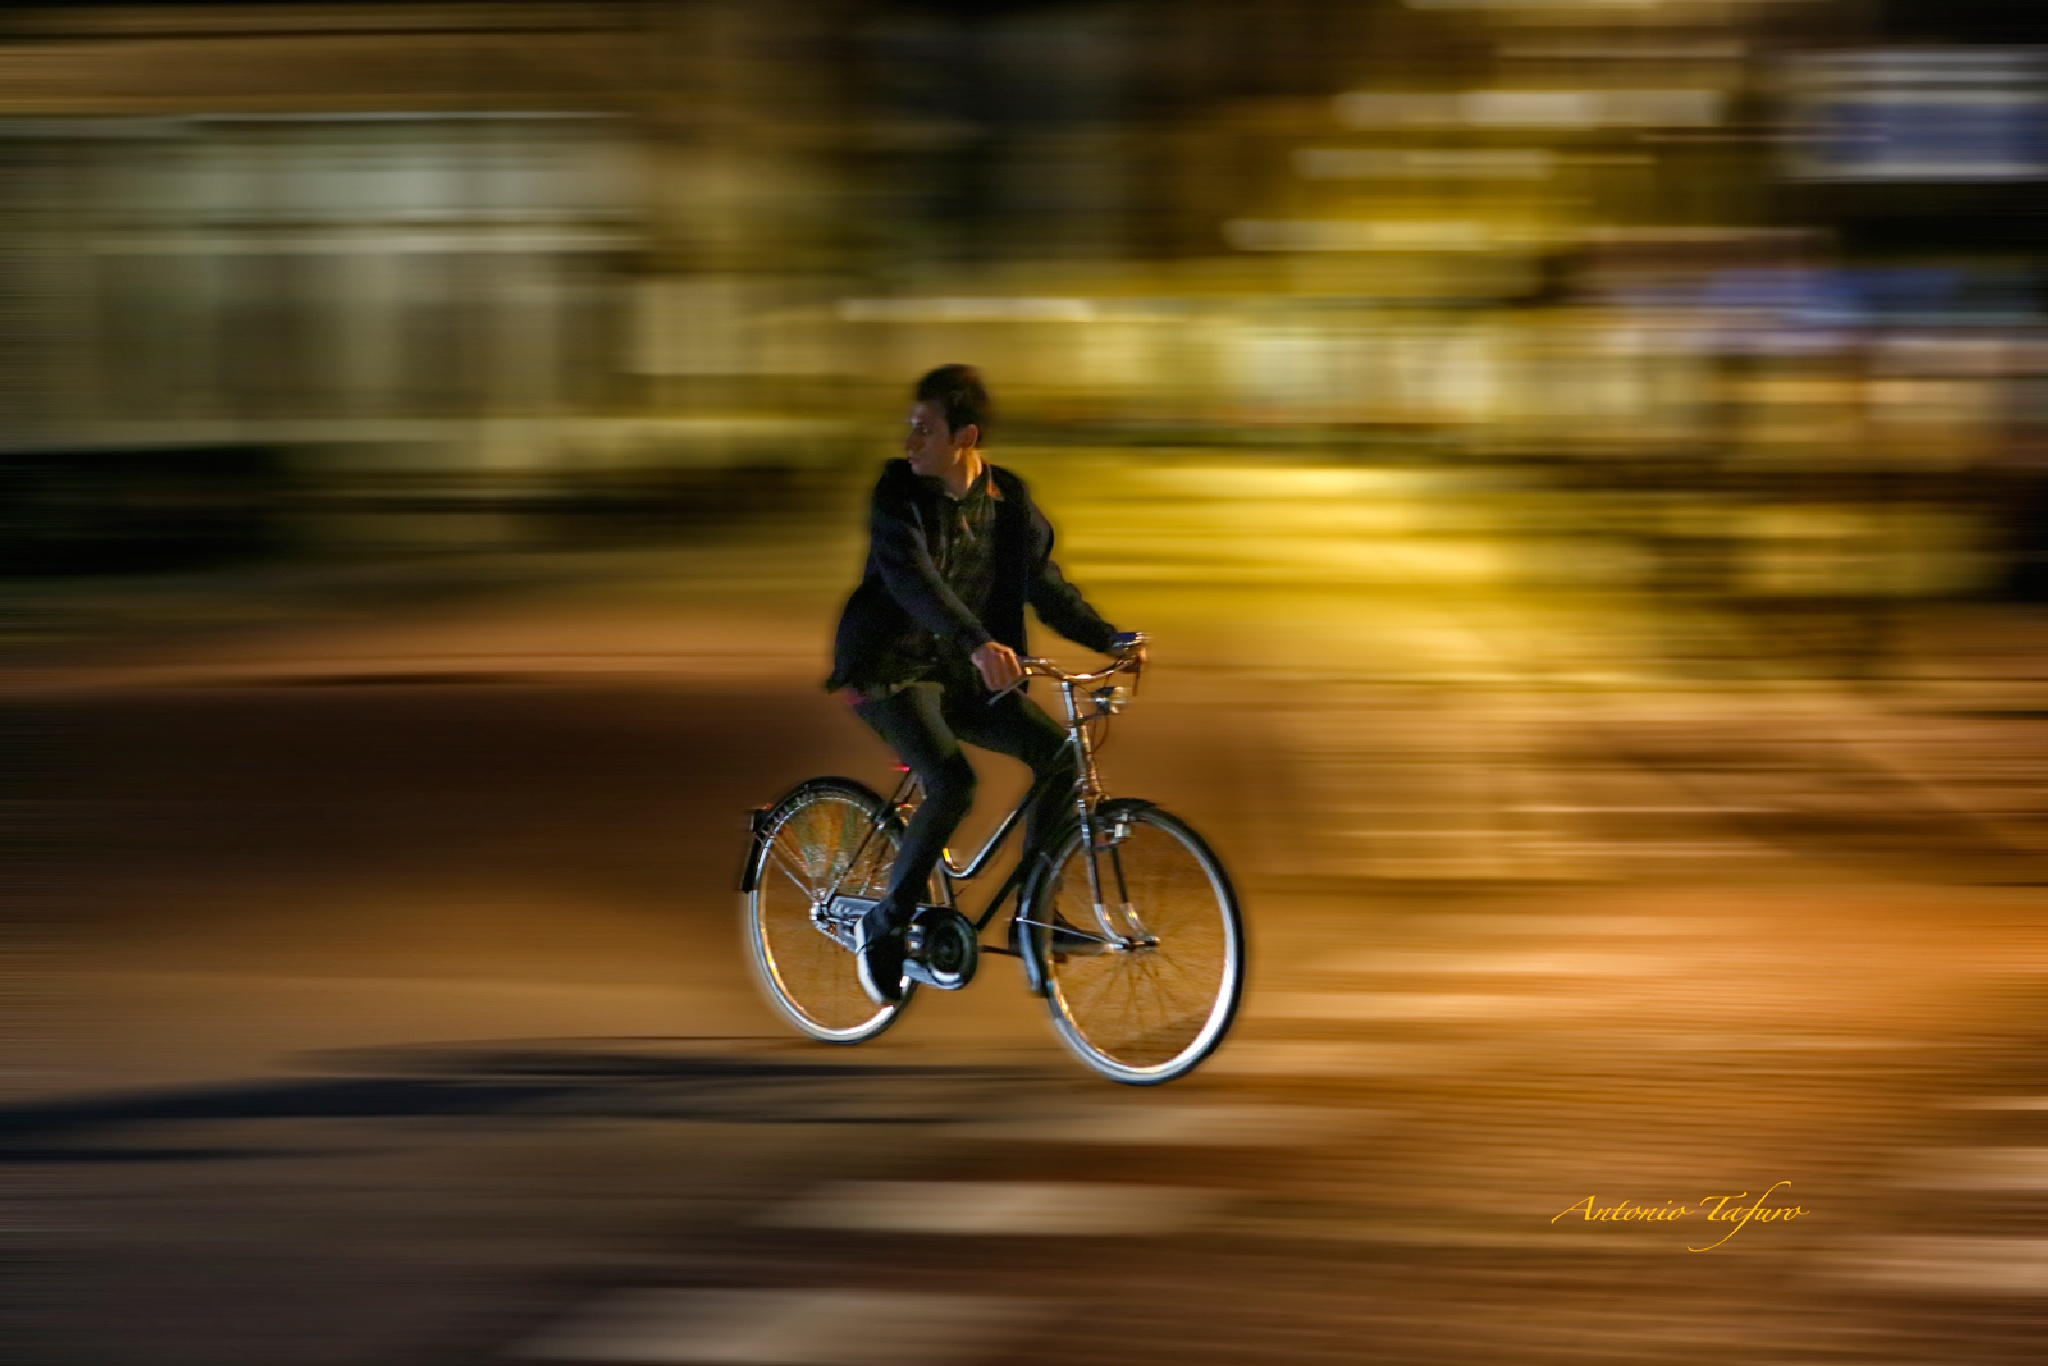 by bike by Antonio Tafuro